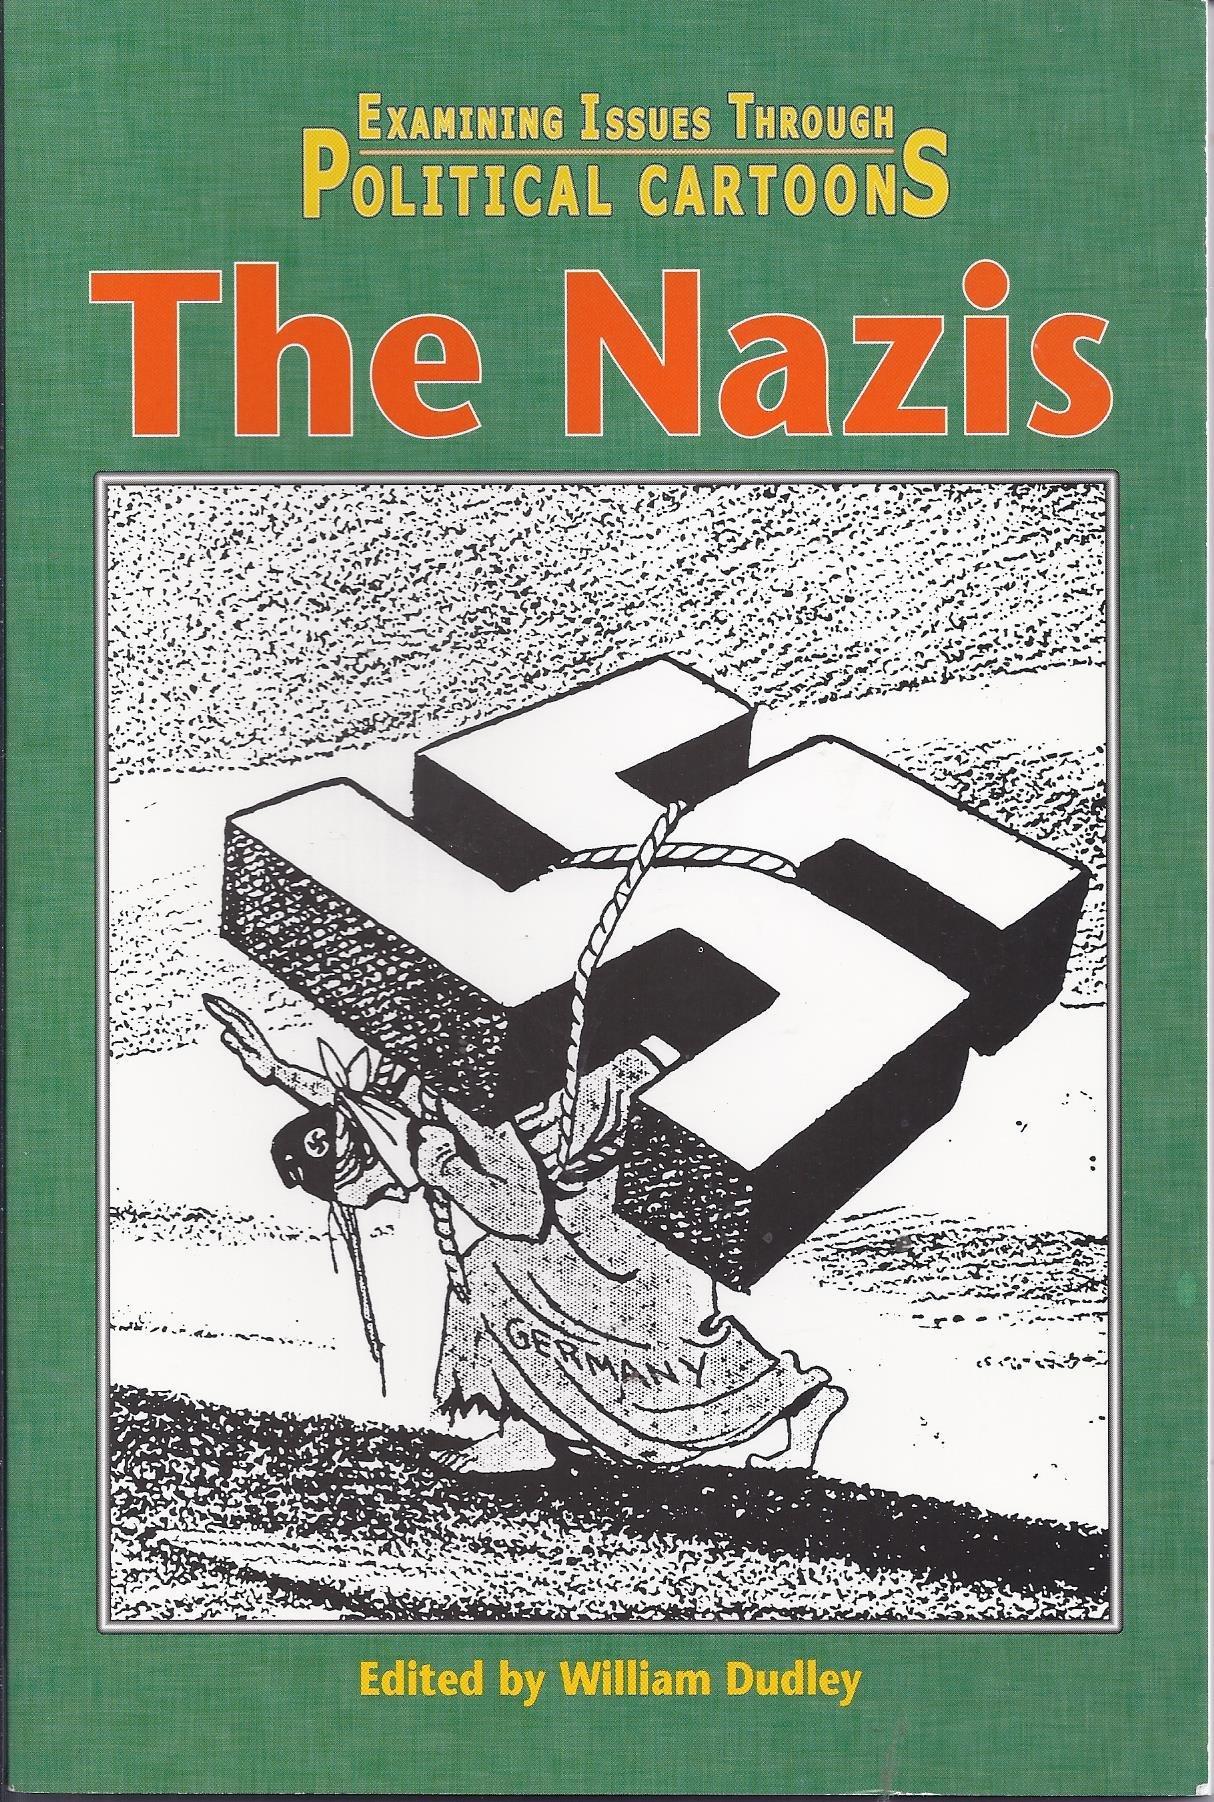 Amazon com: The Nazis (Examining Issues Through Political